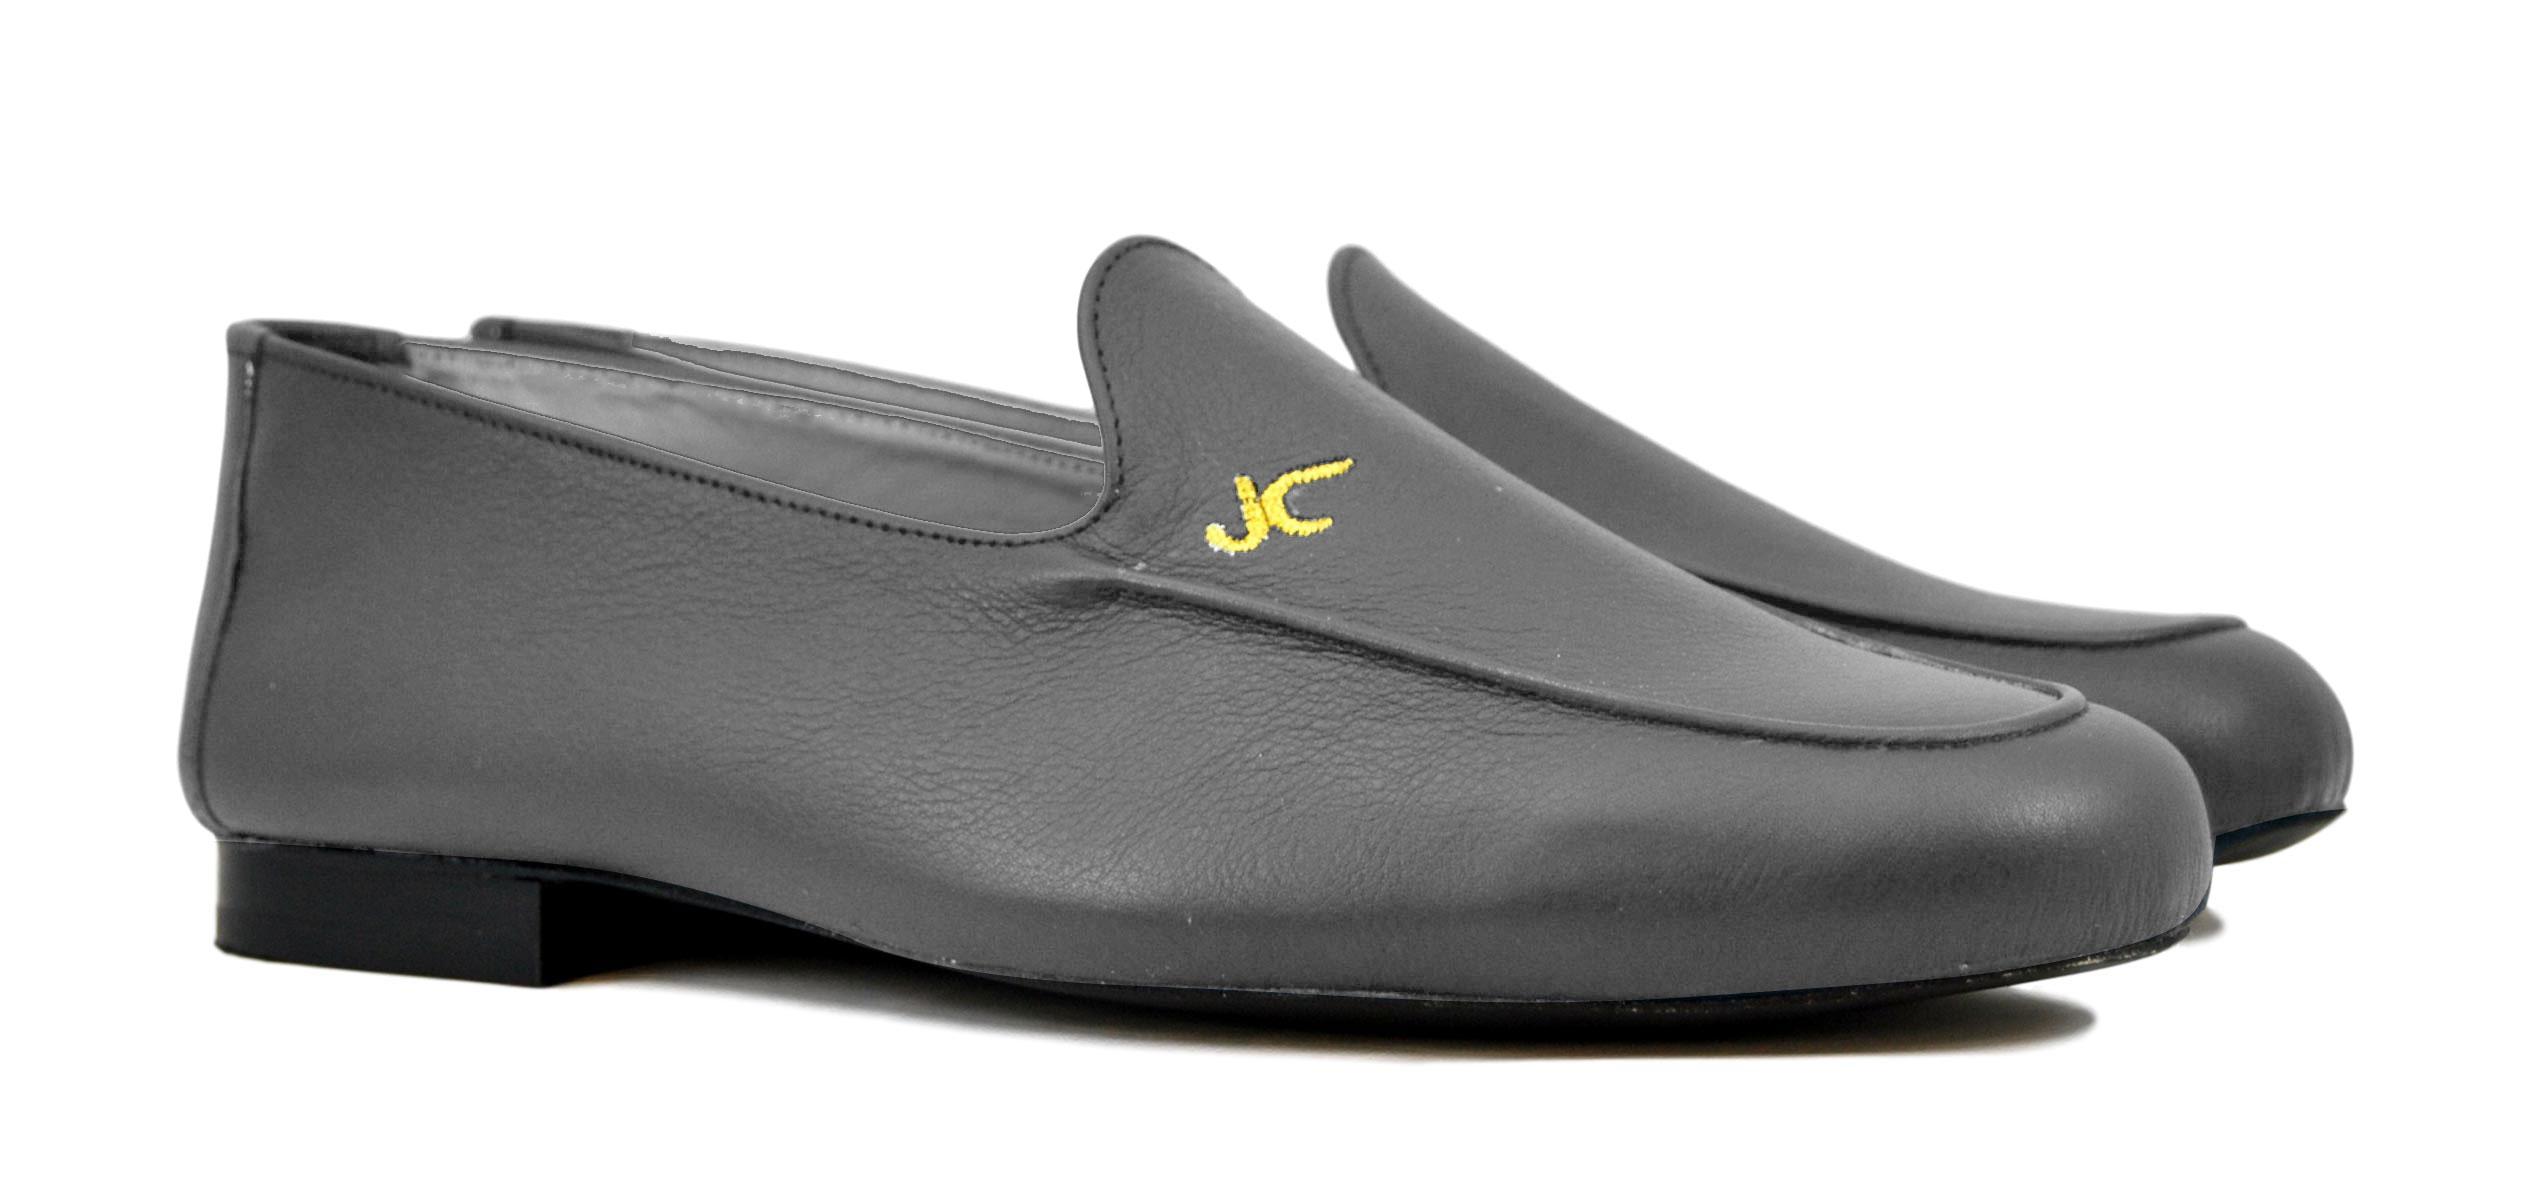 Foto 5 de Zapatos Julio Iglesias 528 JC Souris Piel Napa